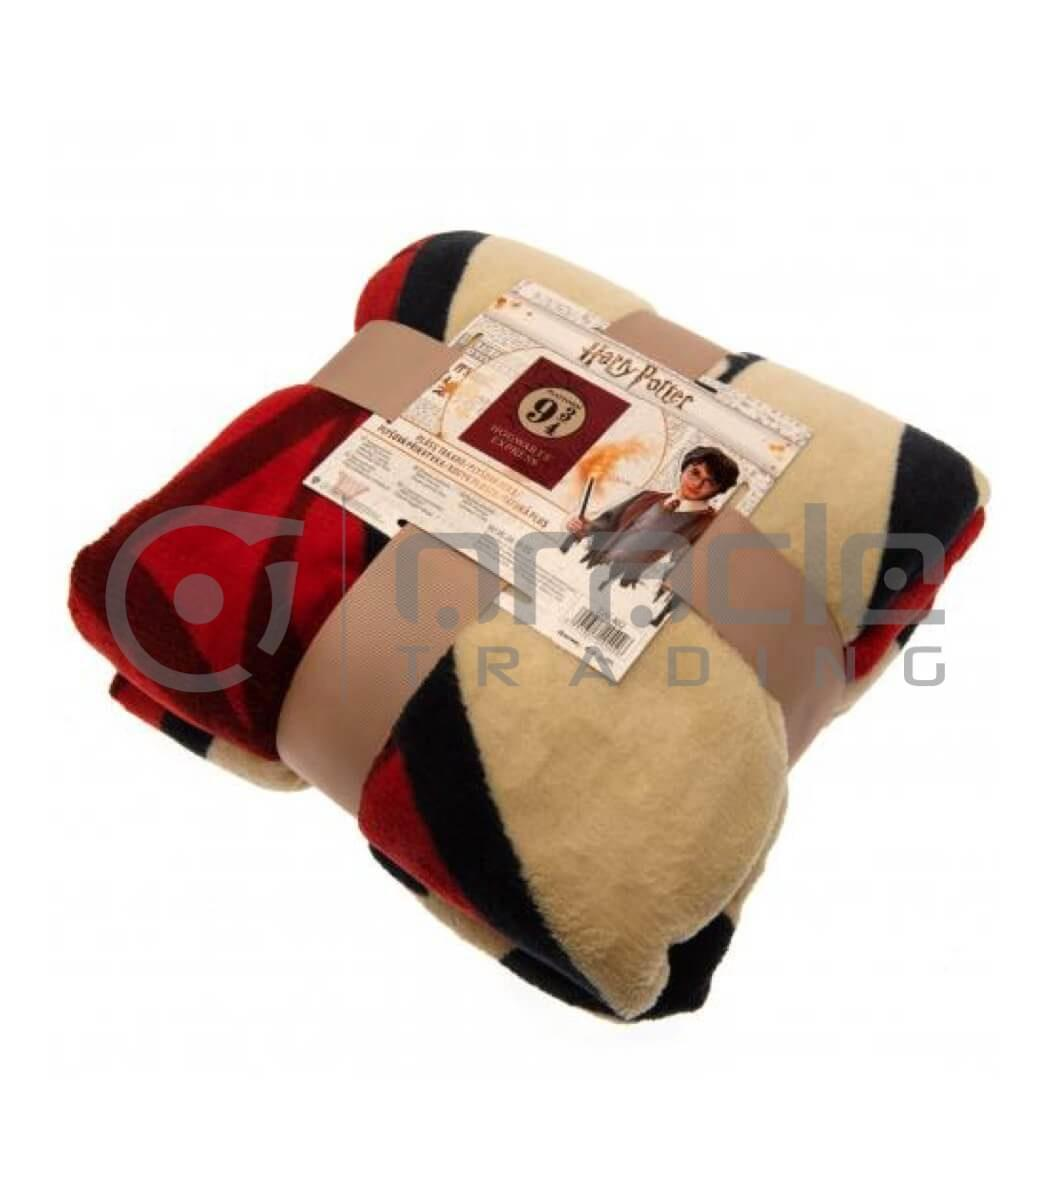 Harry Potter Fleece Blanket - Platform 9 & 3 Quarters